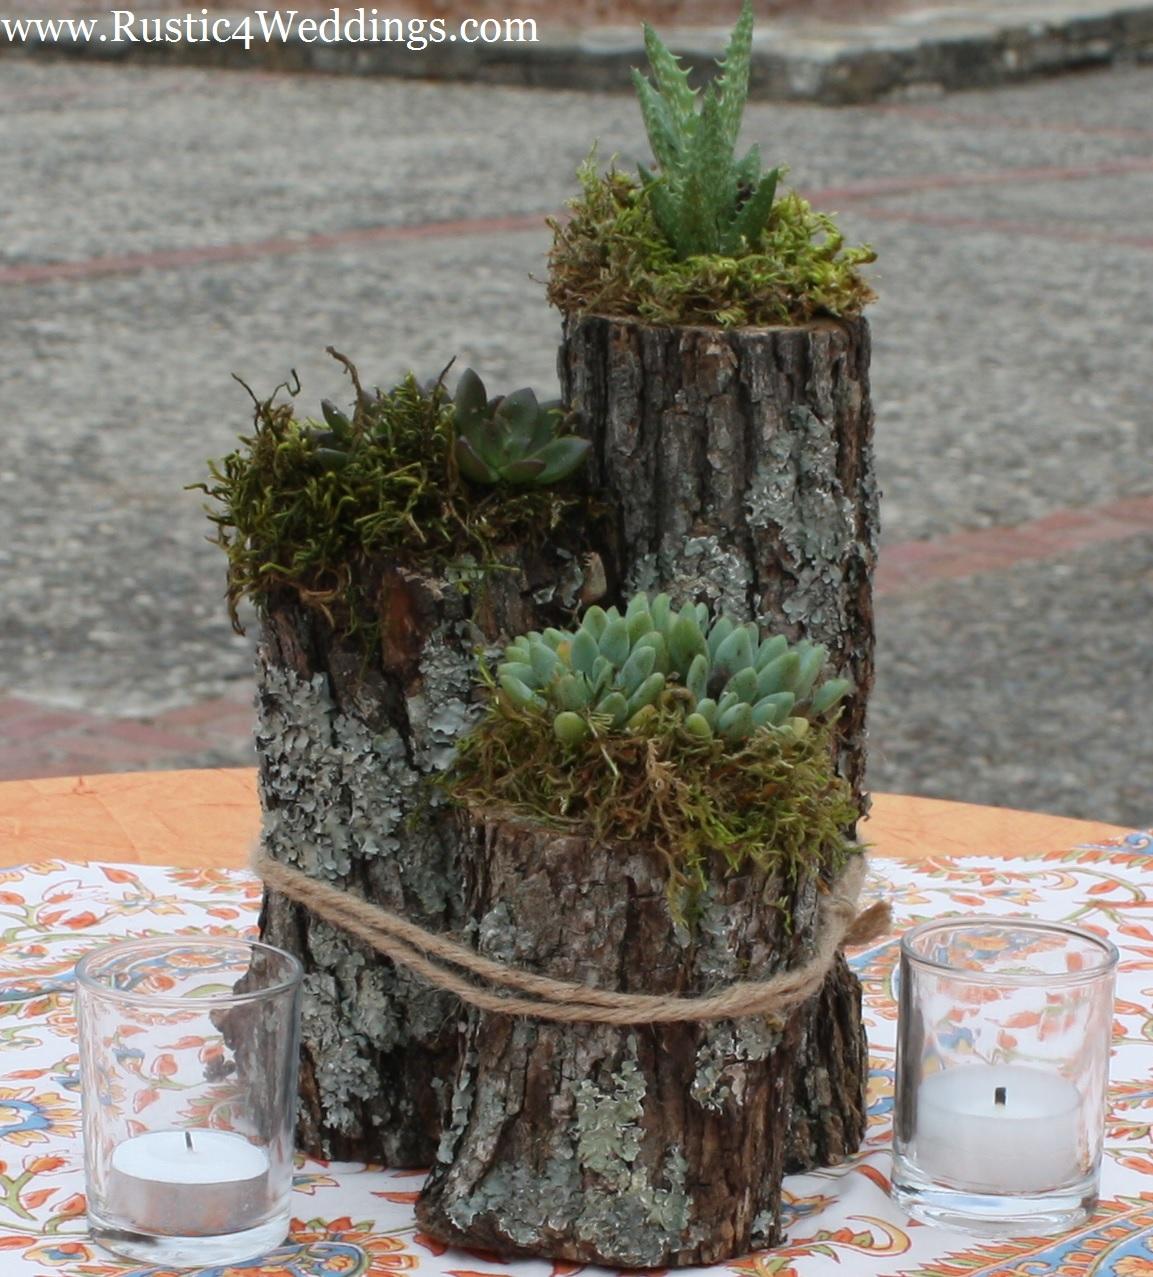 rustic 4 weddings rustic succulent plant holder. Black Bedroom Furniture Sets. Home Design Ideas